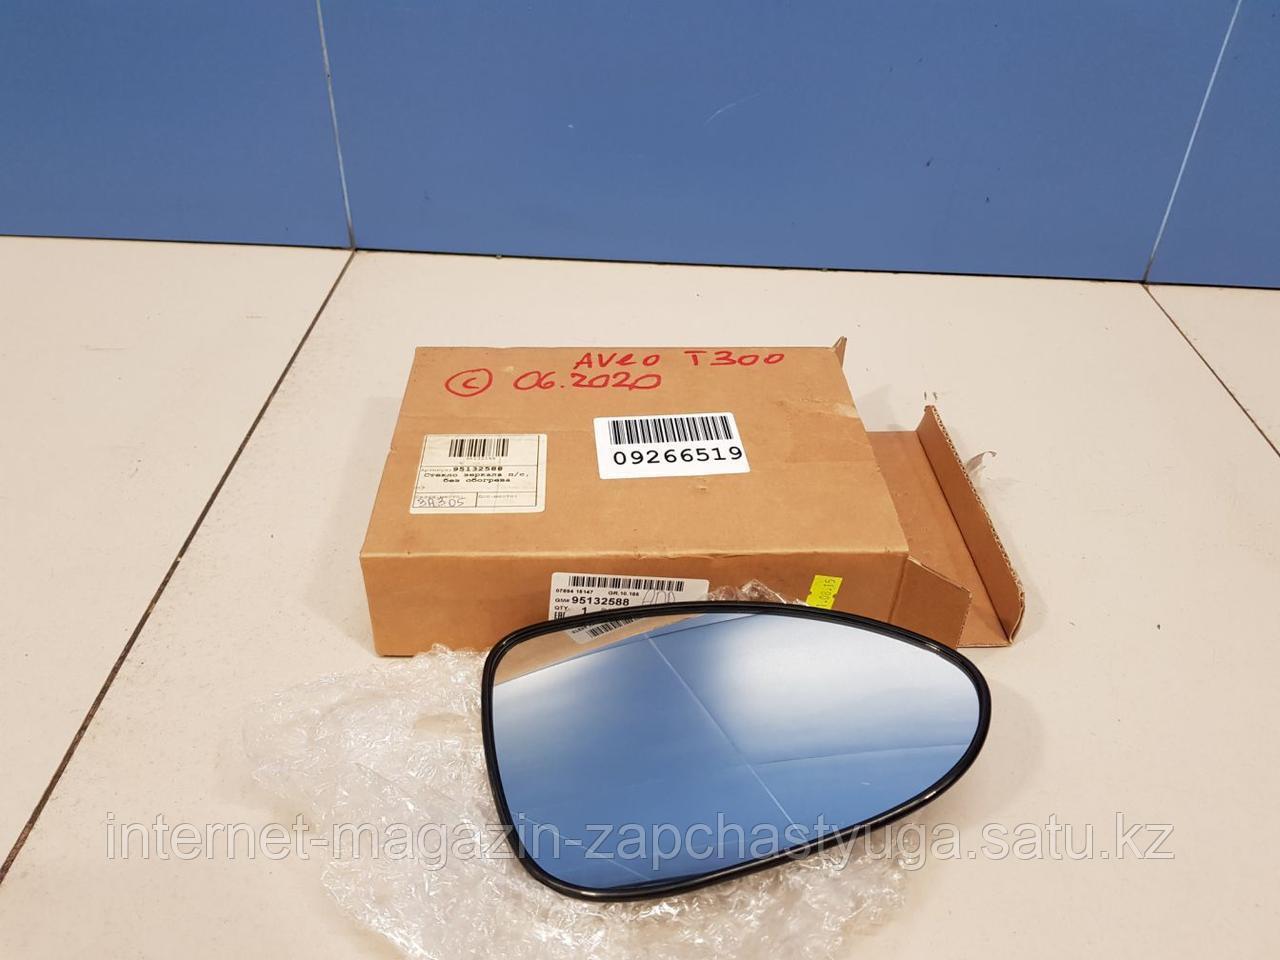 95132588 Зеркальный элемент правый для Chevrolet Aveo T300 2011-2015 Б/У - фото 1